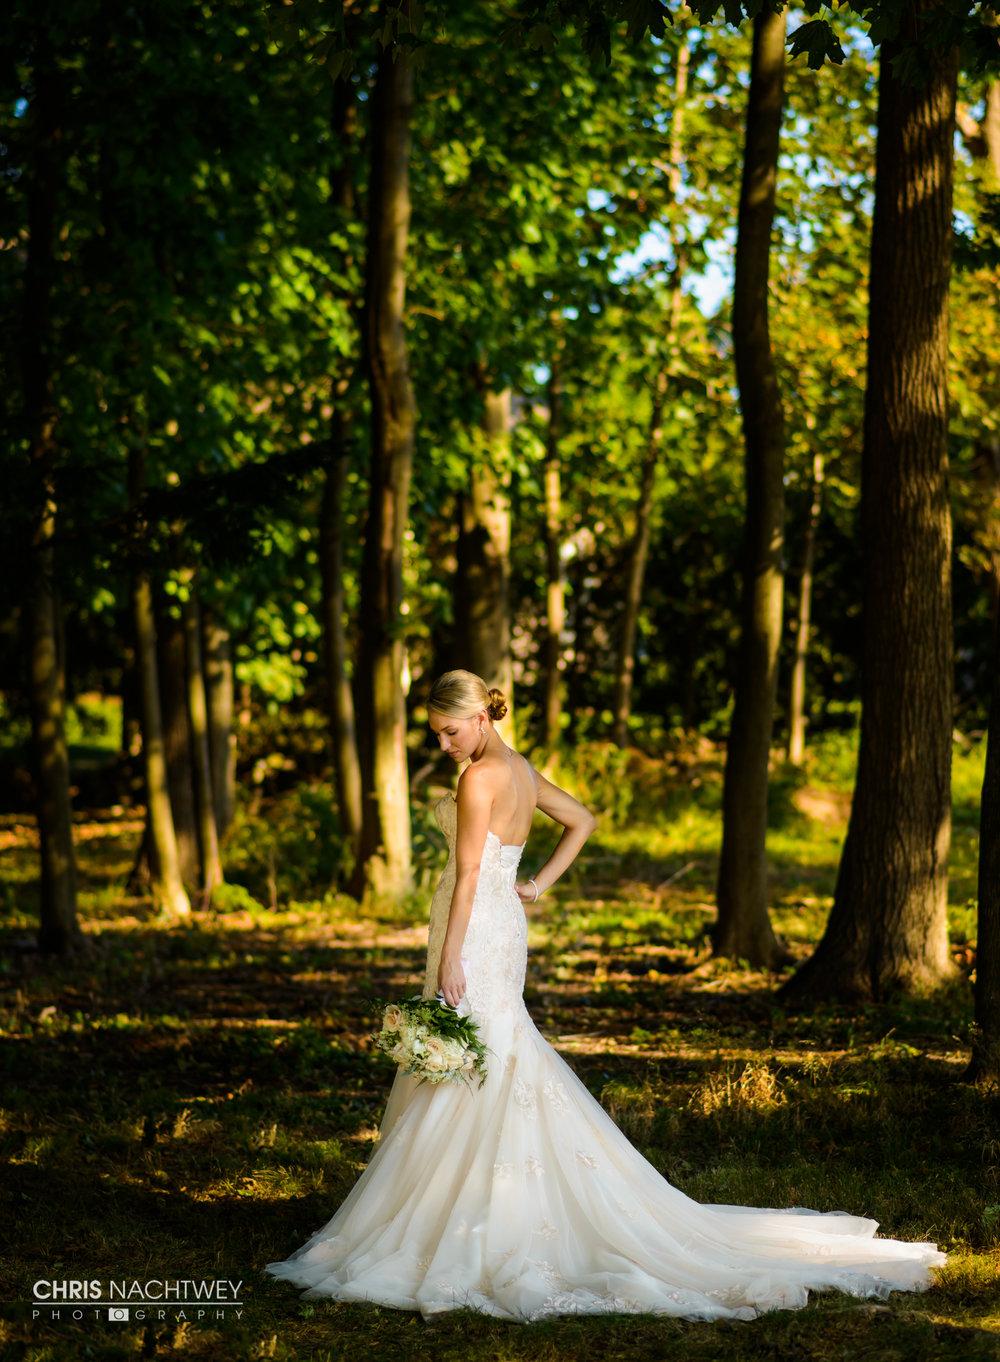 artistic-connecticut-wedding-photographers-chris-nachtwey-2017-7.jpg